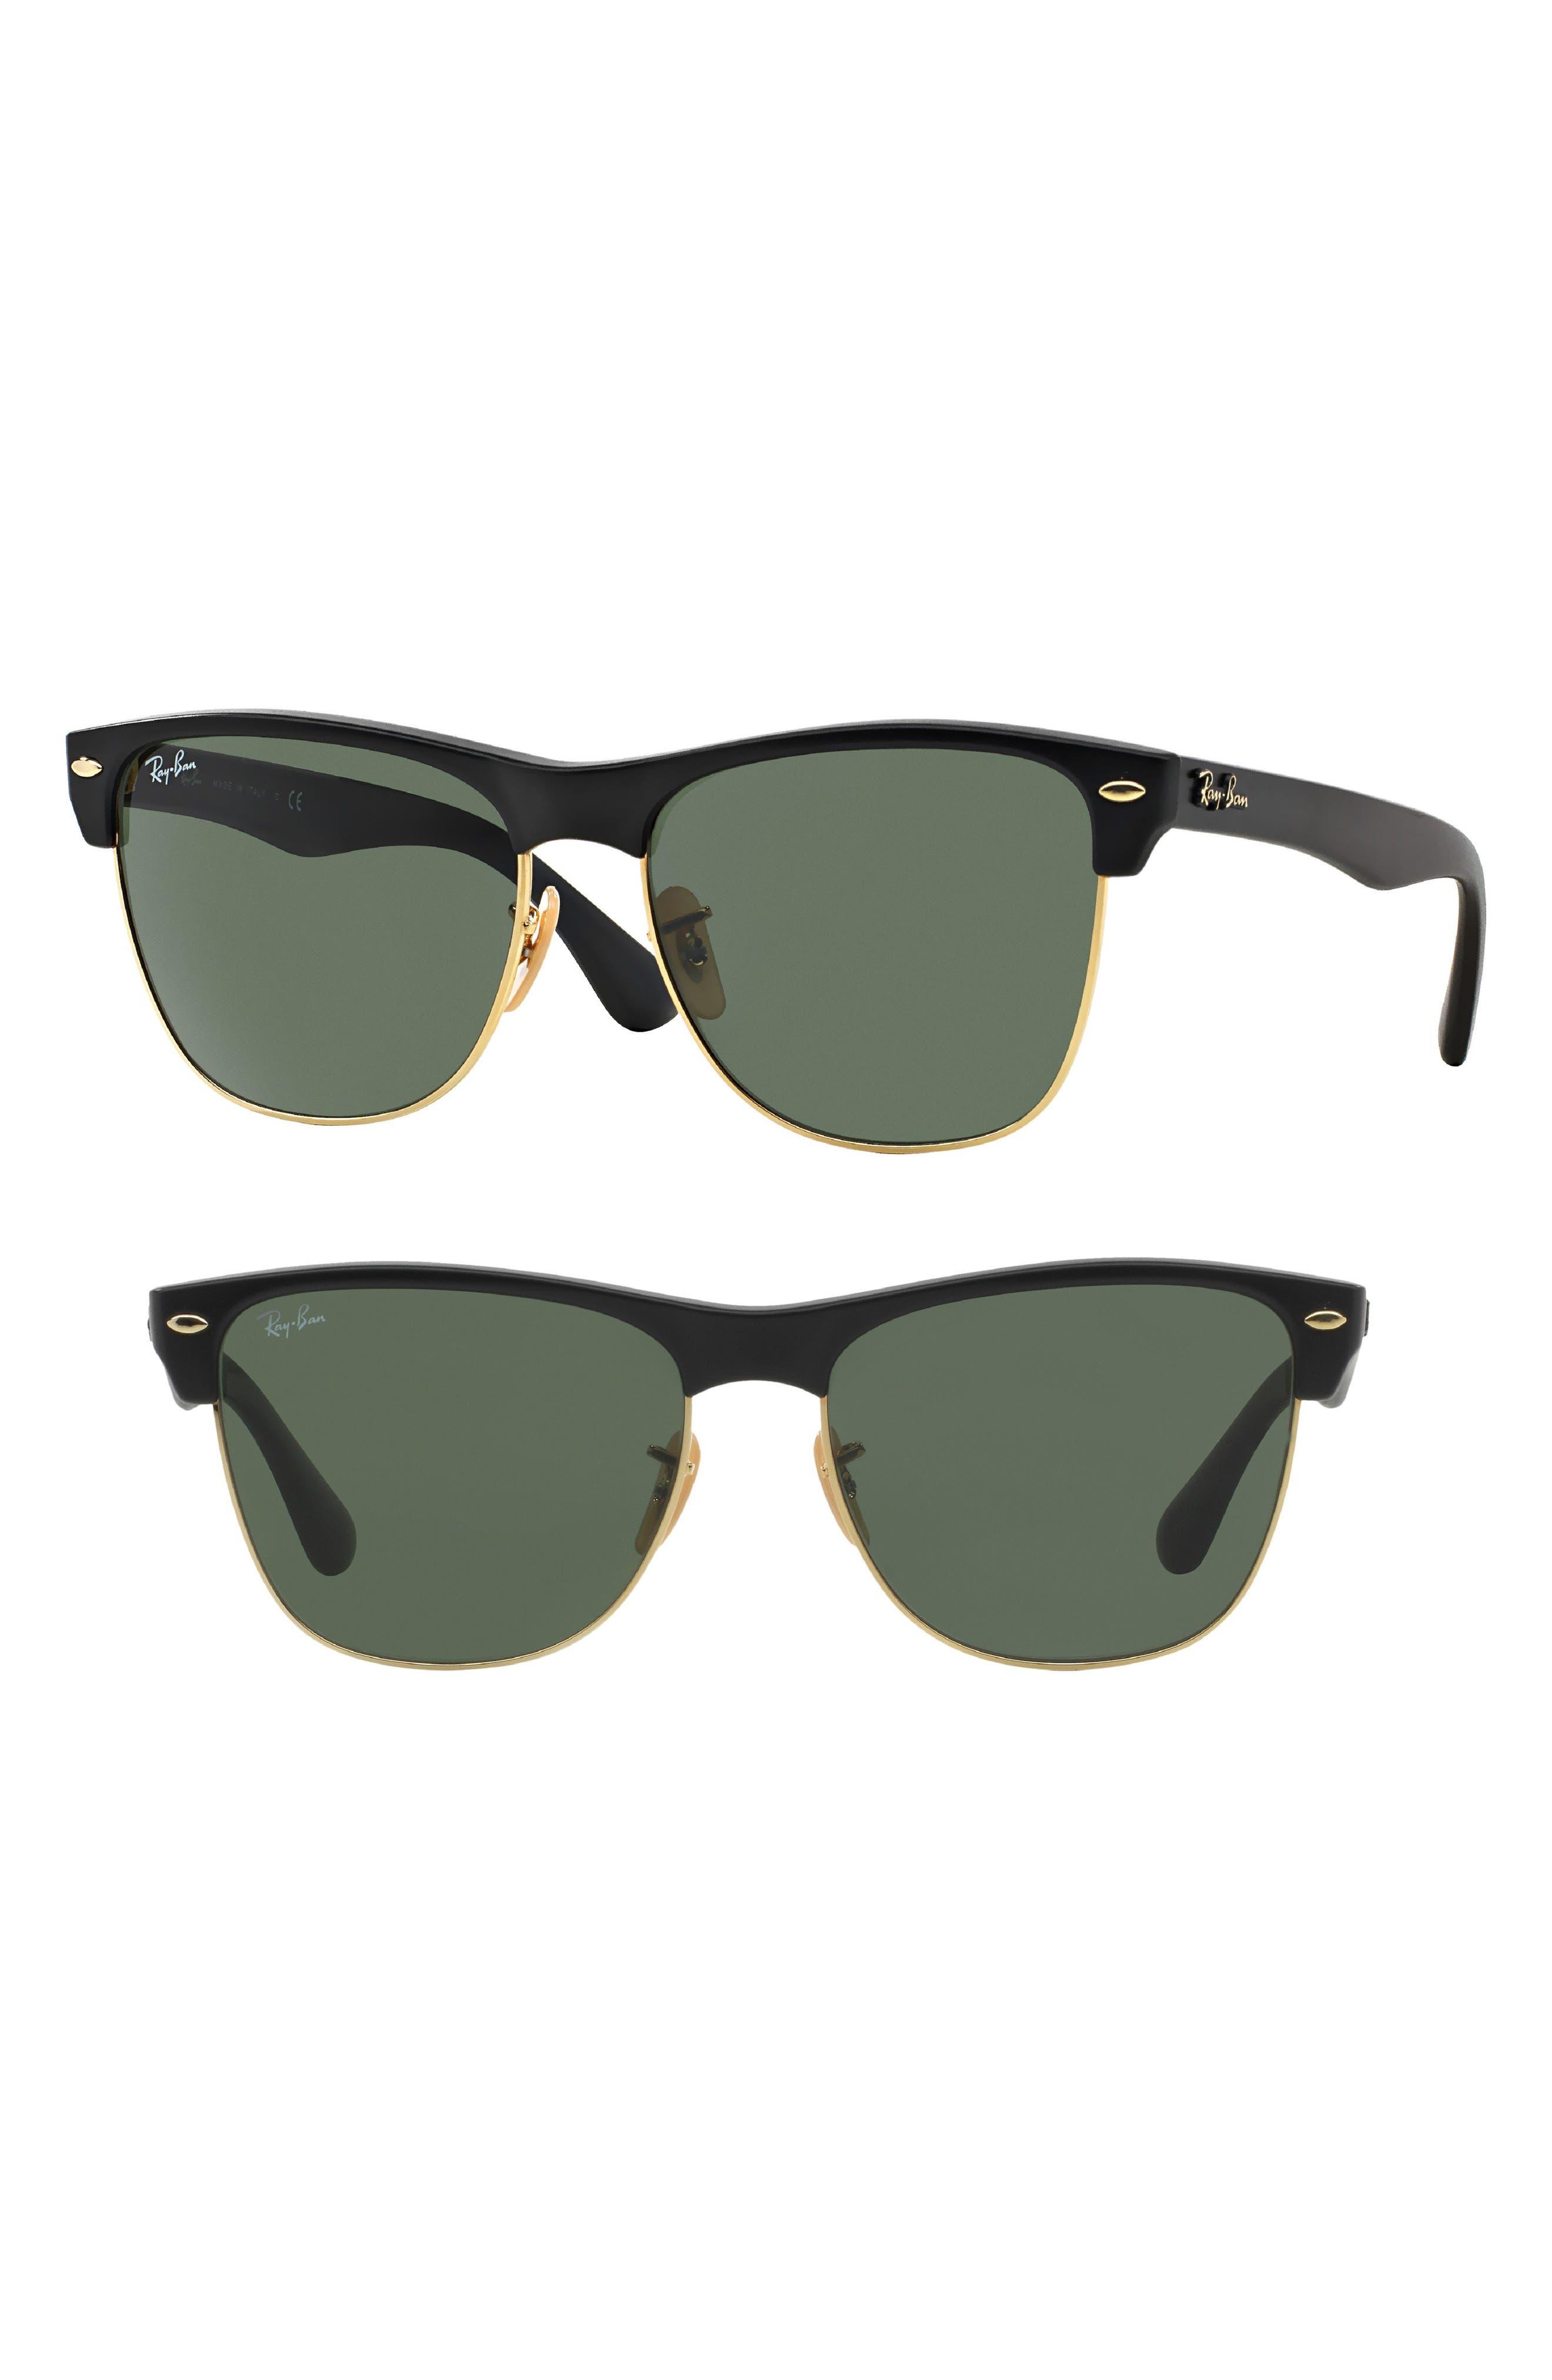 RAY-BAN, Highstreet 57mm Sunglasses, Main thumbnail 1, color, DEMI BLACK/ GREEN SOLID